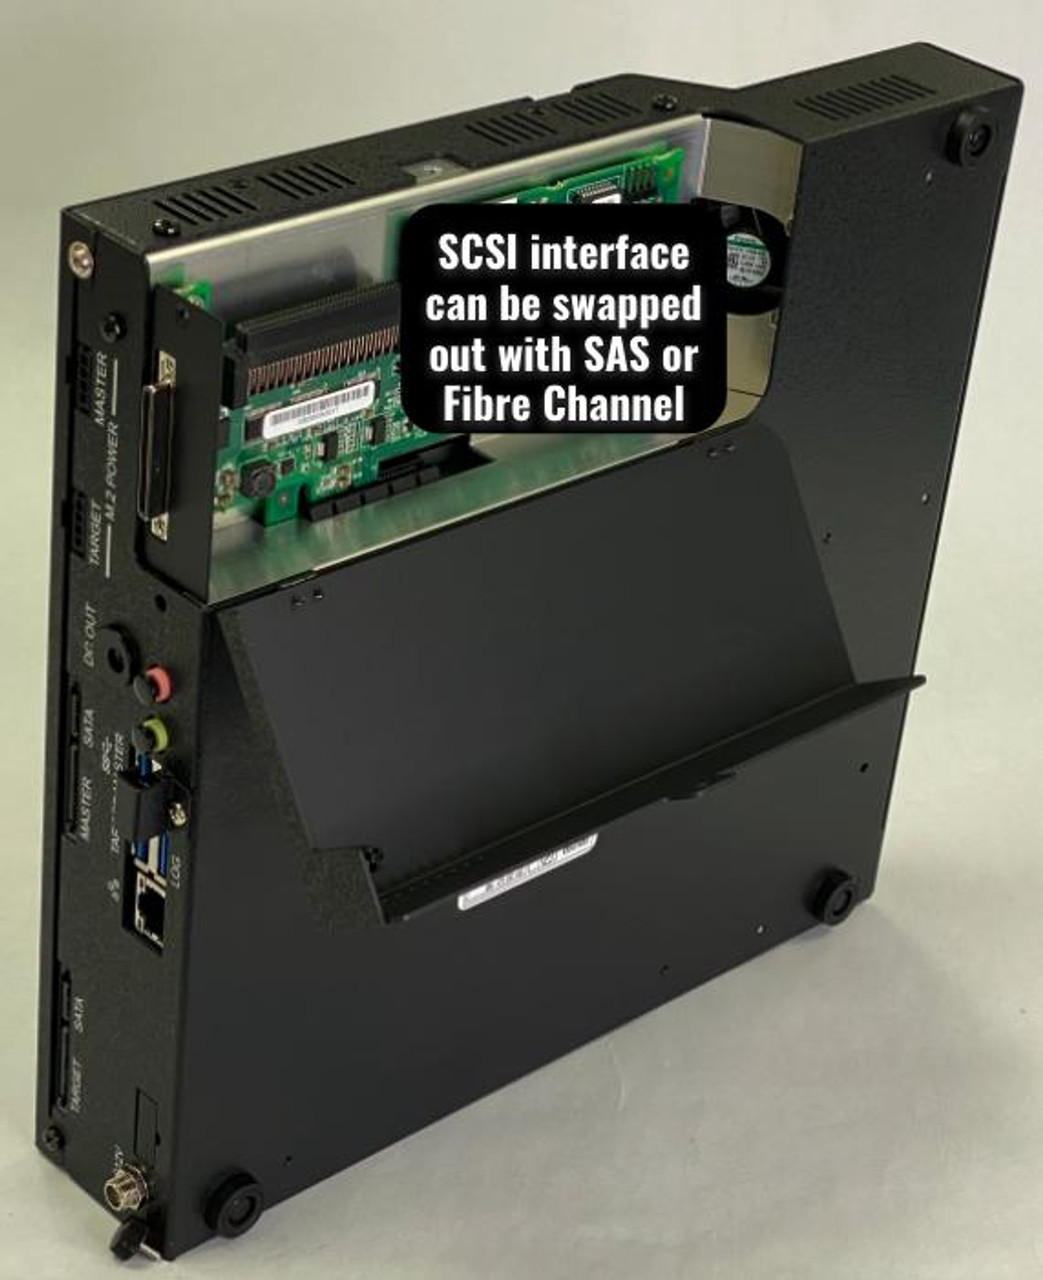 FX2260 showing SCSI Interface